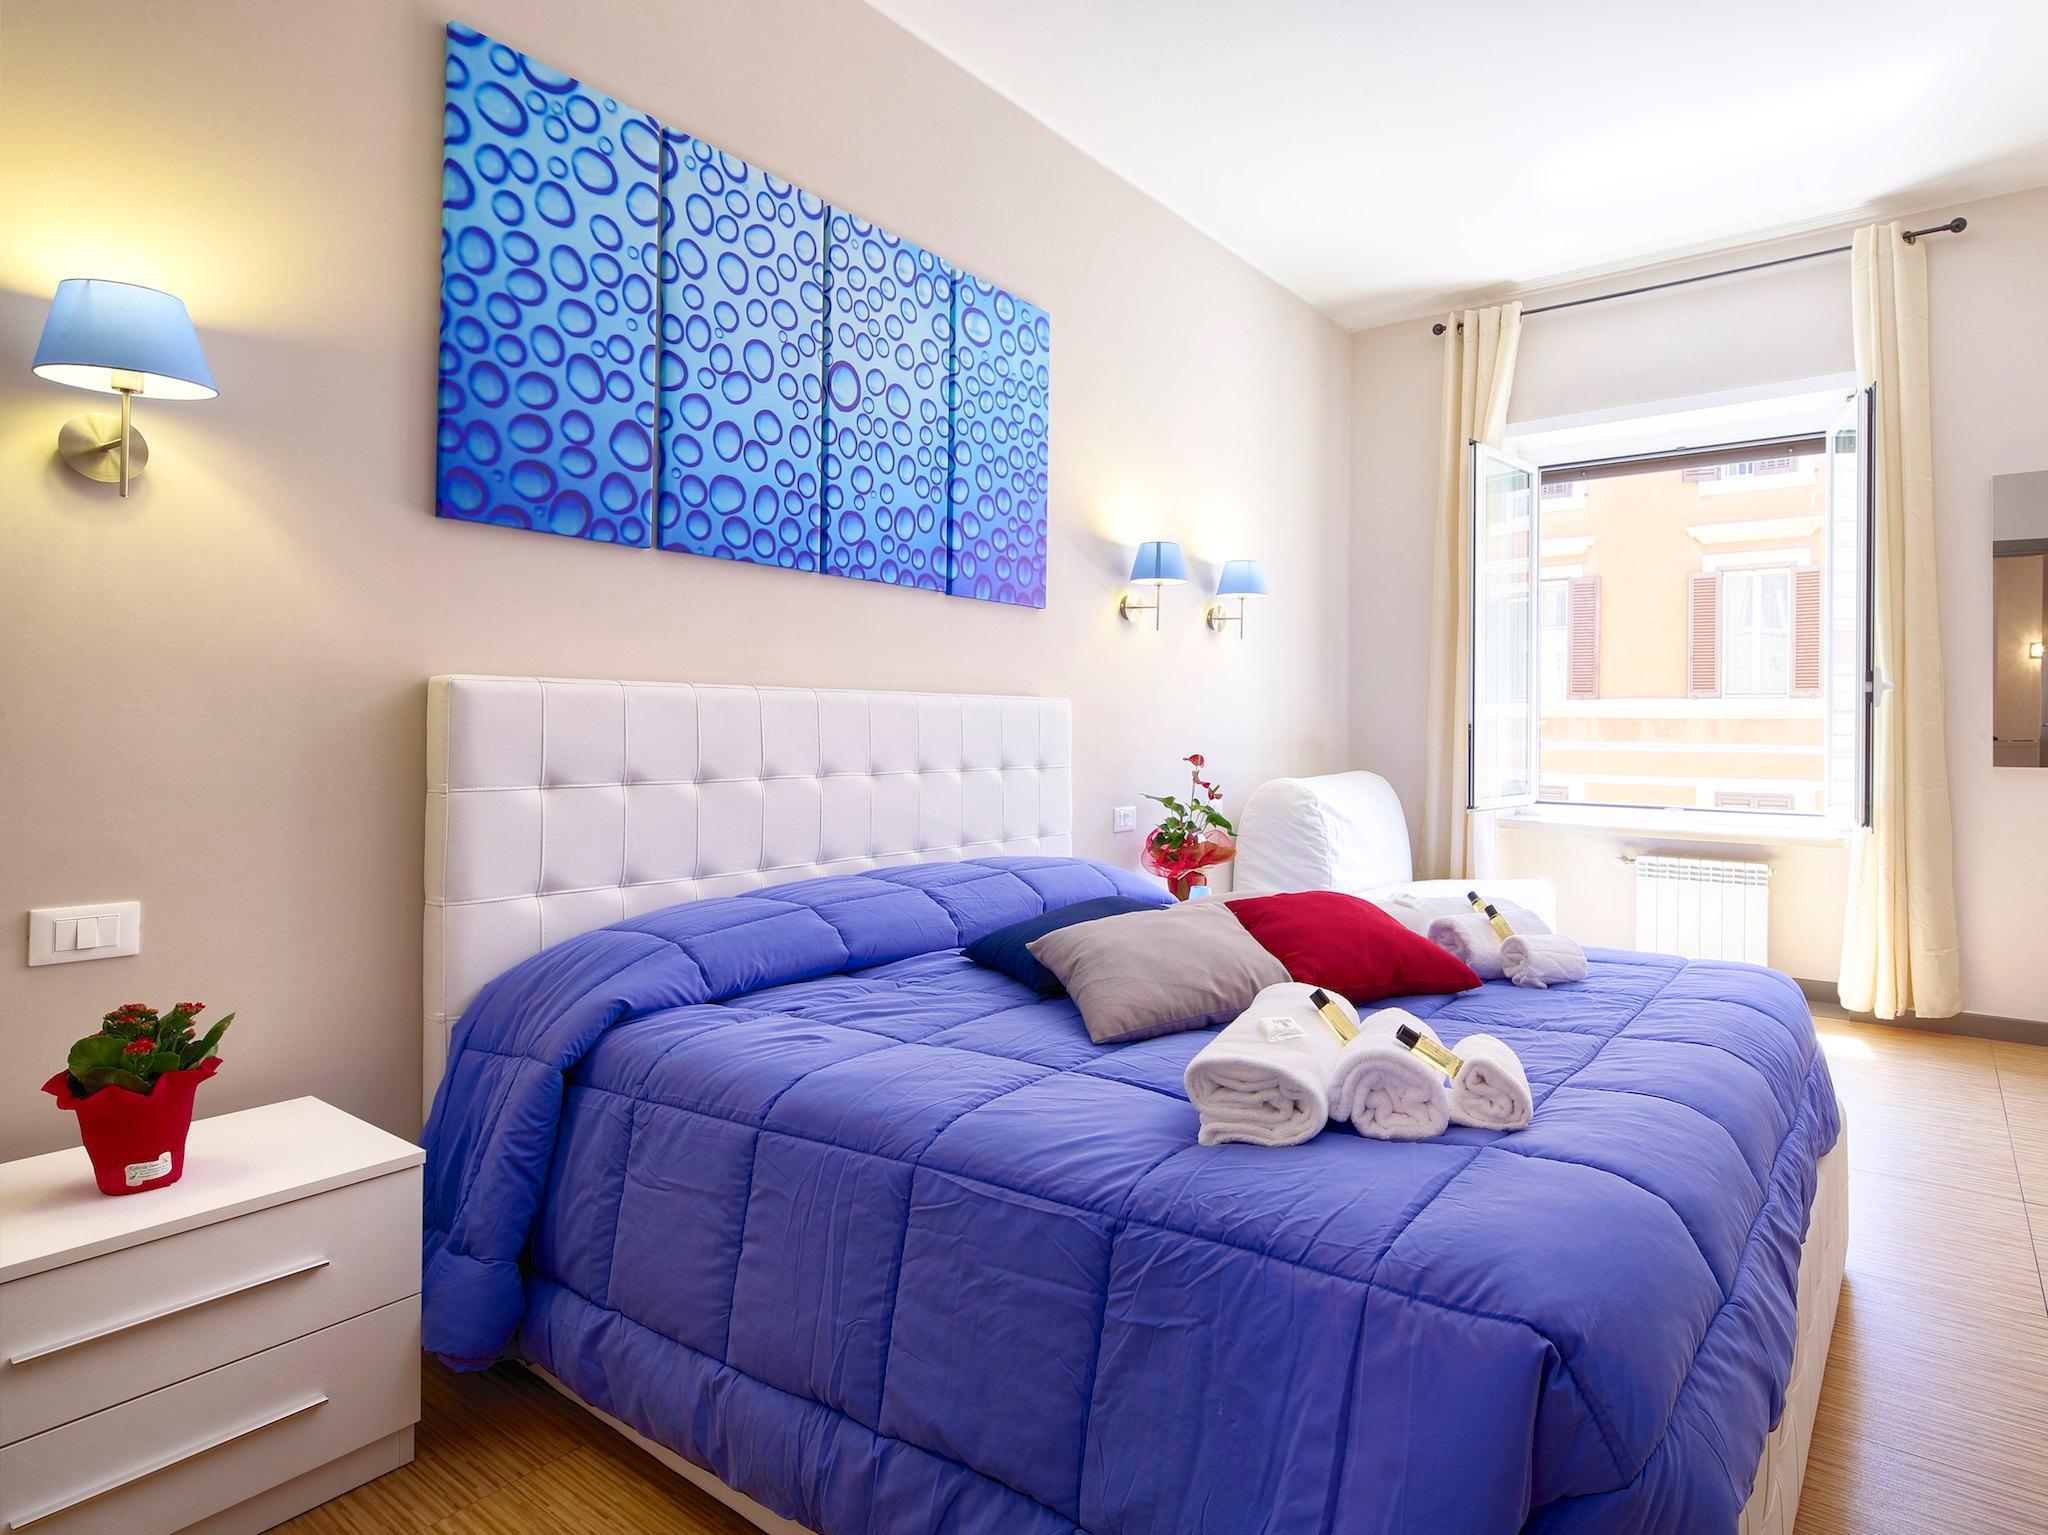 Bed & Breakfast Porta Pia Rooms